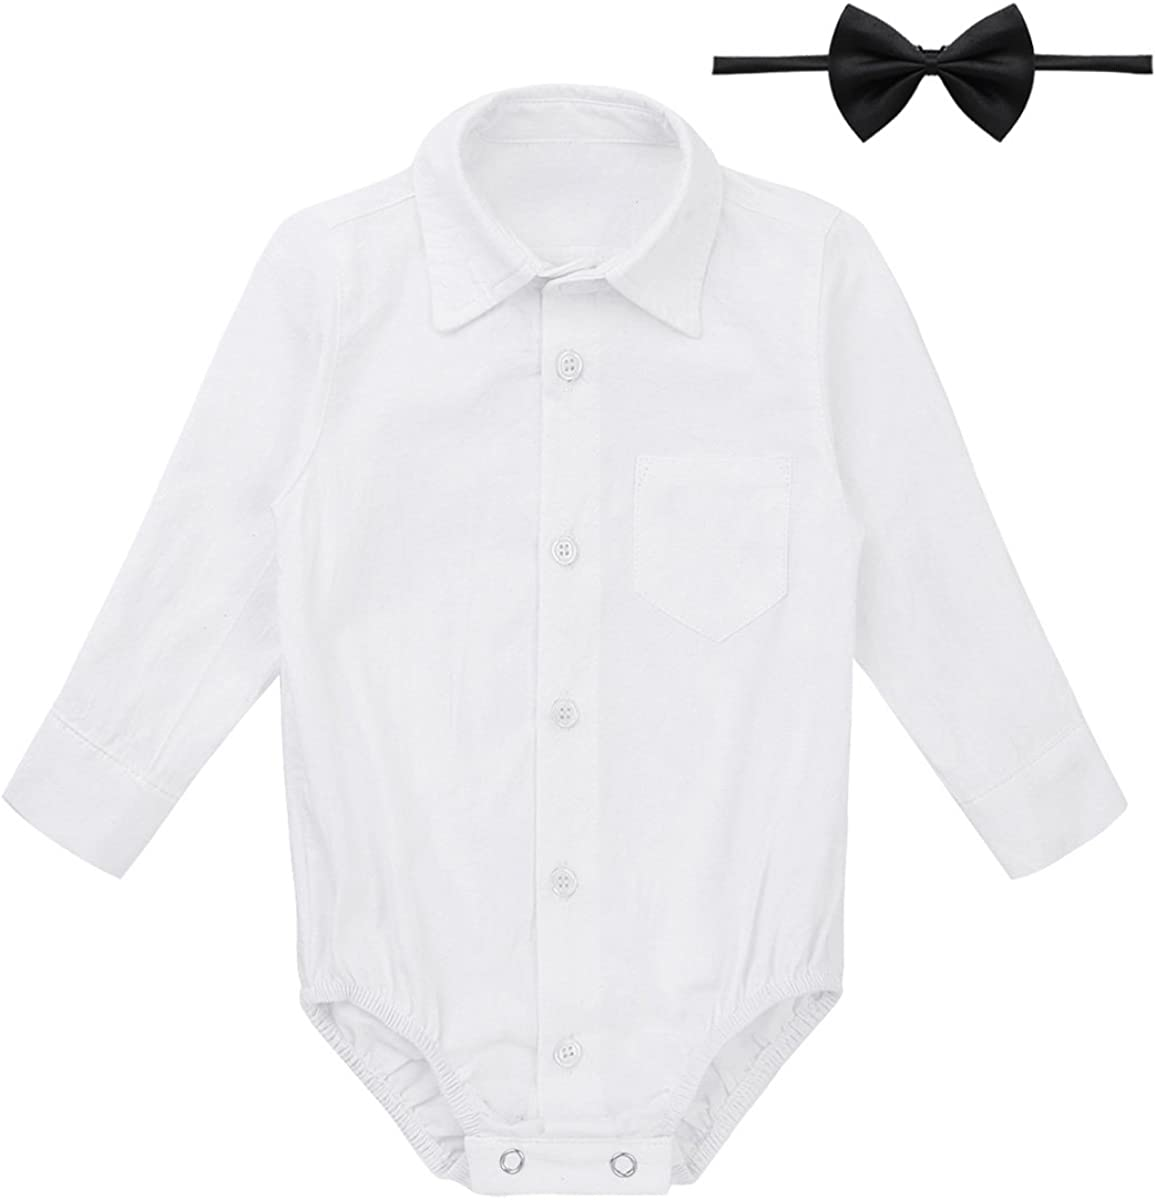 MSemis Infant Baby Boys Short//Long Sleeves Gentleman Bowtie Shirt Romper Bodysuit Toddlers Wedding Party Dresses